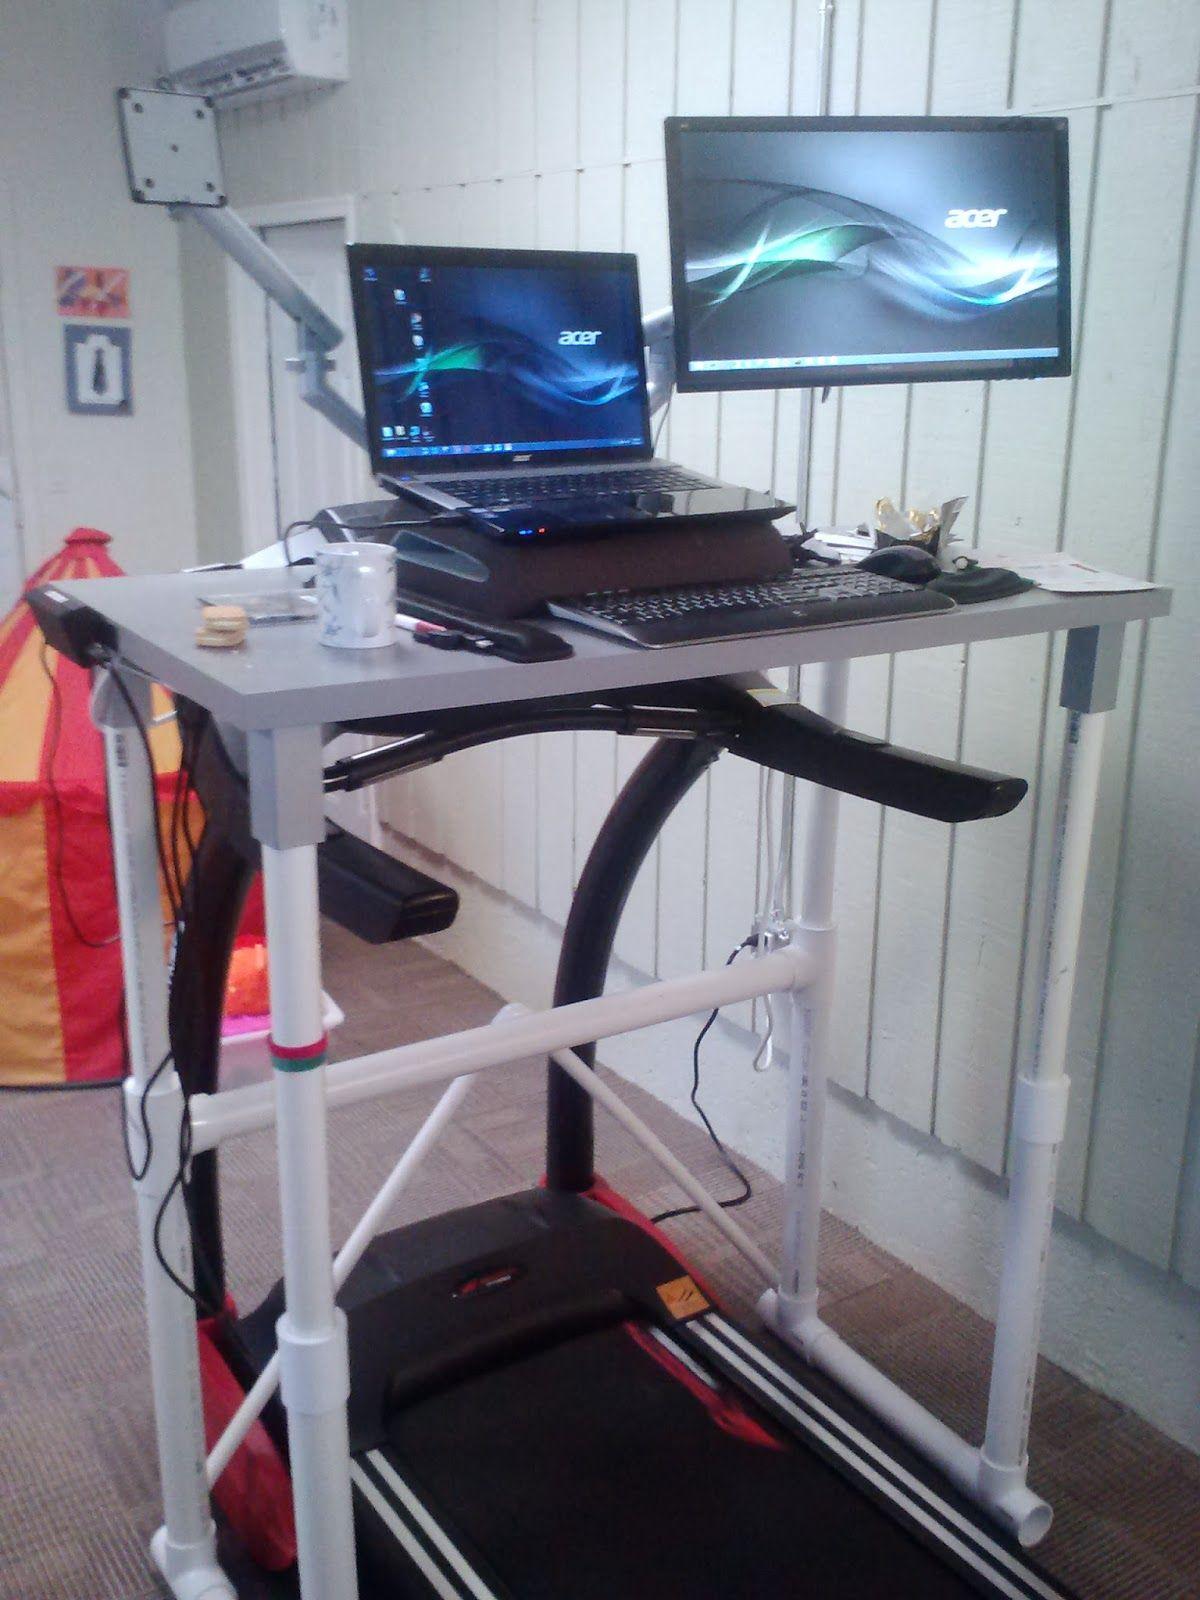 Redetermine Diy Pvc Ikea Treadmill Desk